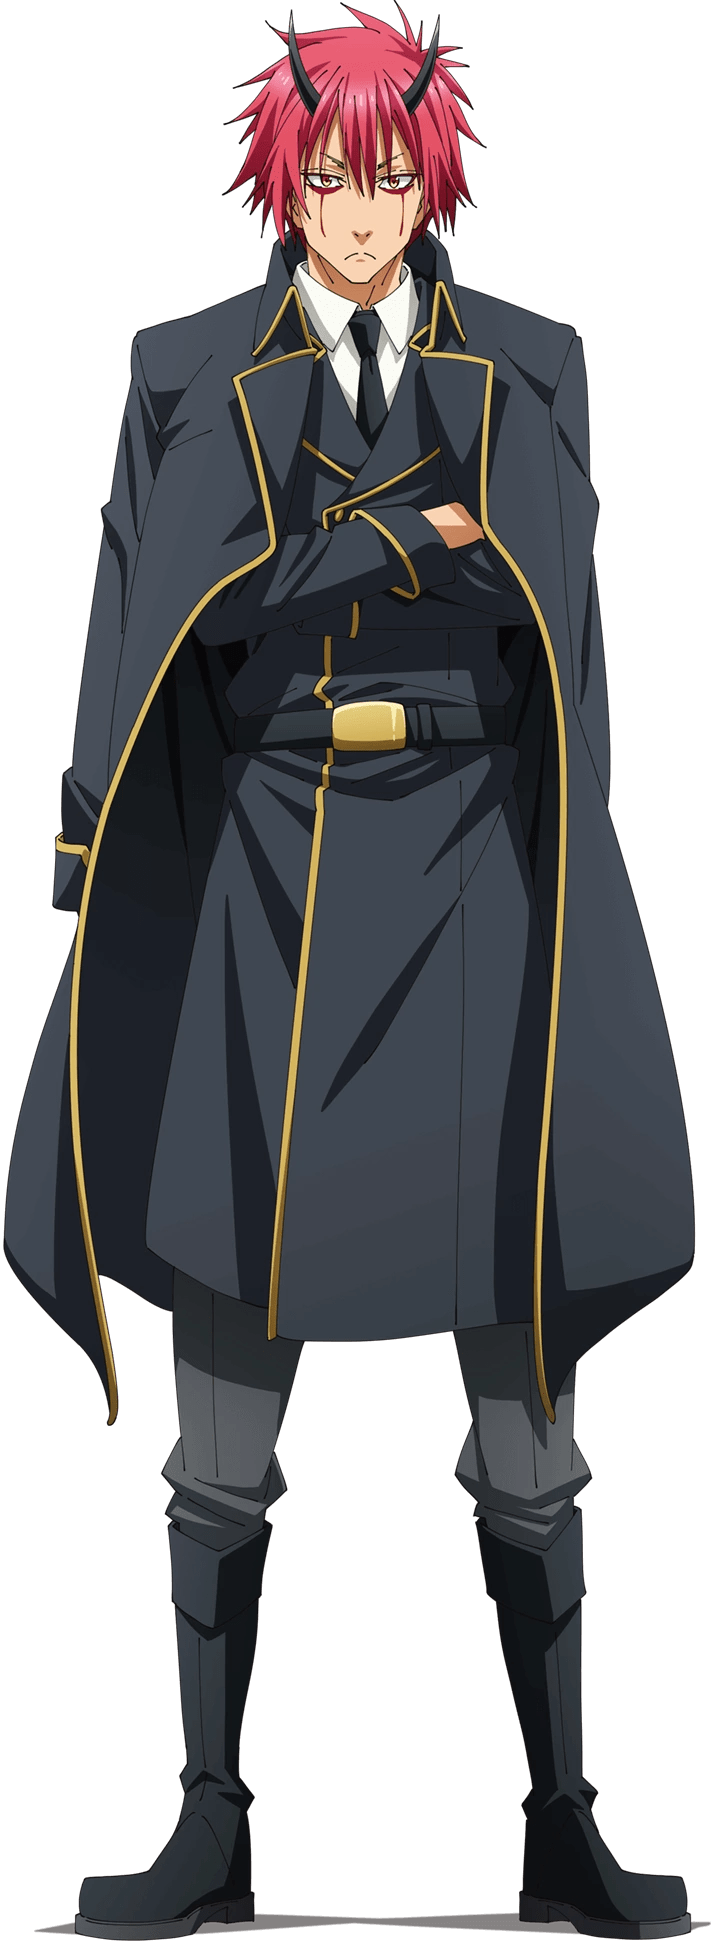 Rimuru's twelve guardian lords 聖魔(リムル)十二守護王, seima(rimuru) juuni shugo ou are the top 12 executives. Benimaru Tensei Shitara Slime Datta Ken Wiki Fandom